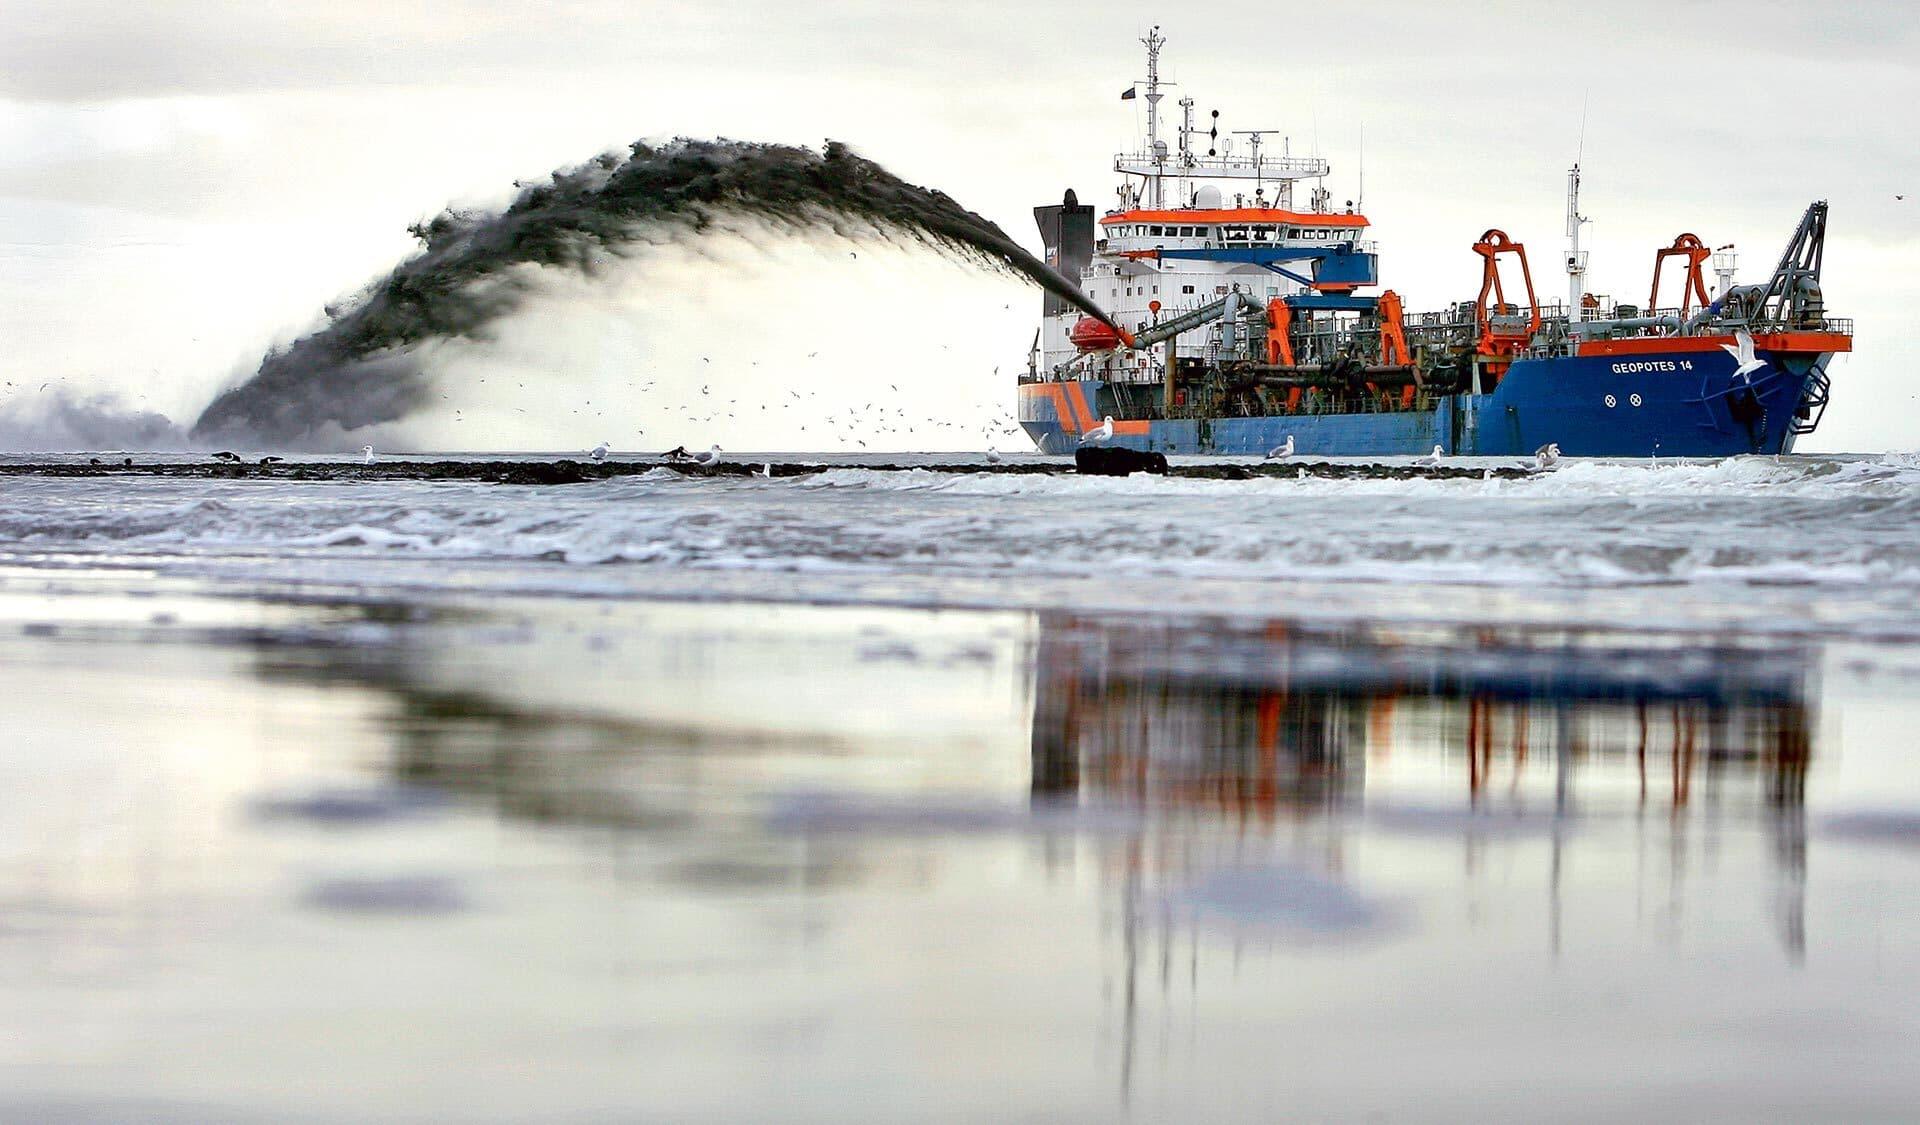 Riesiger Saugbagger holt den Sand vom Meeresboden